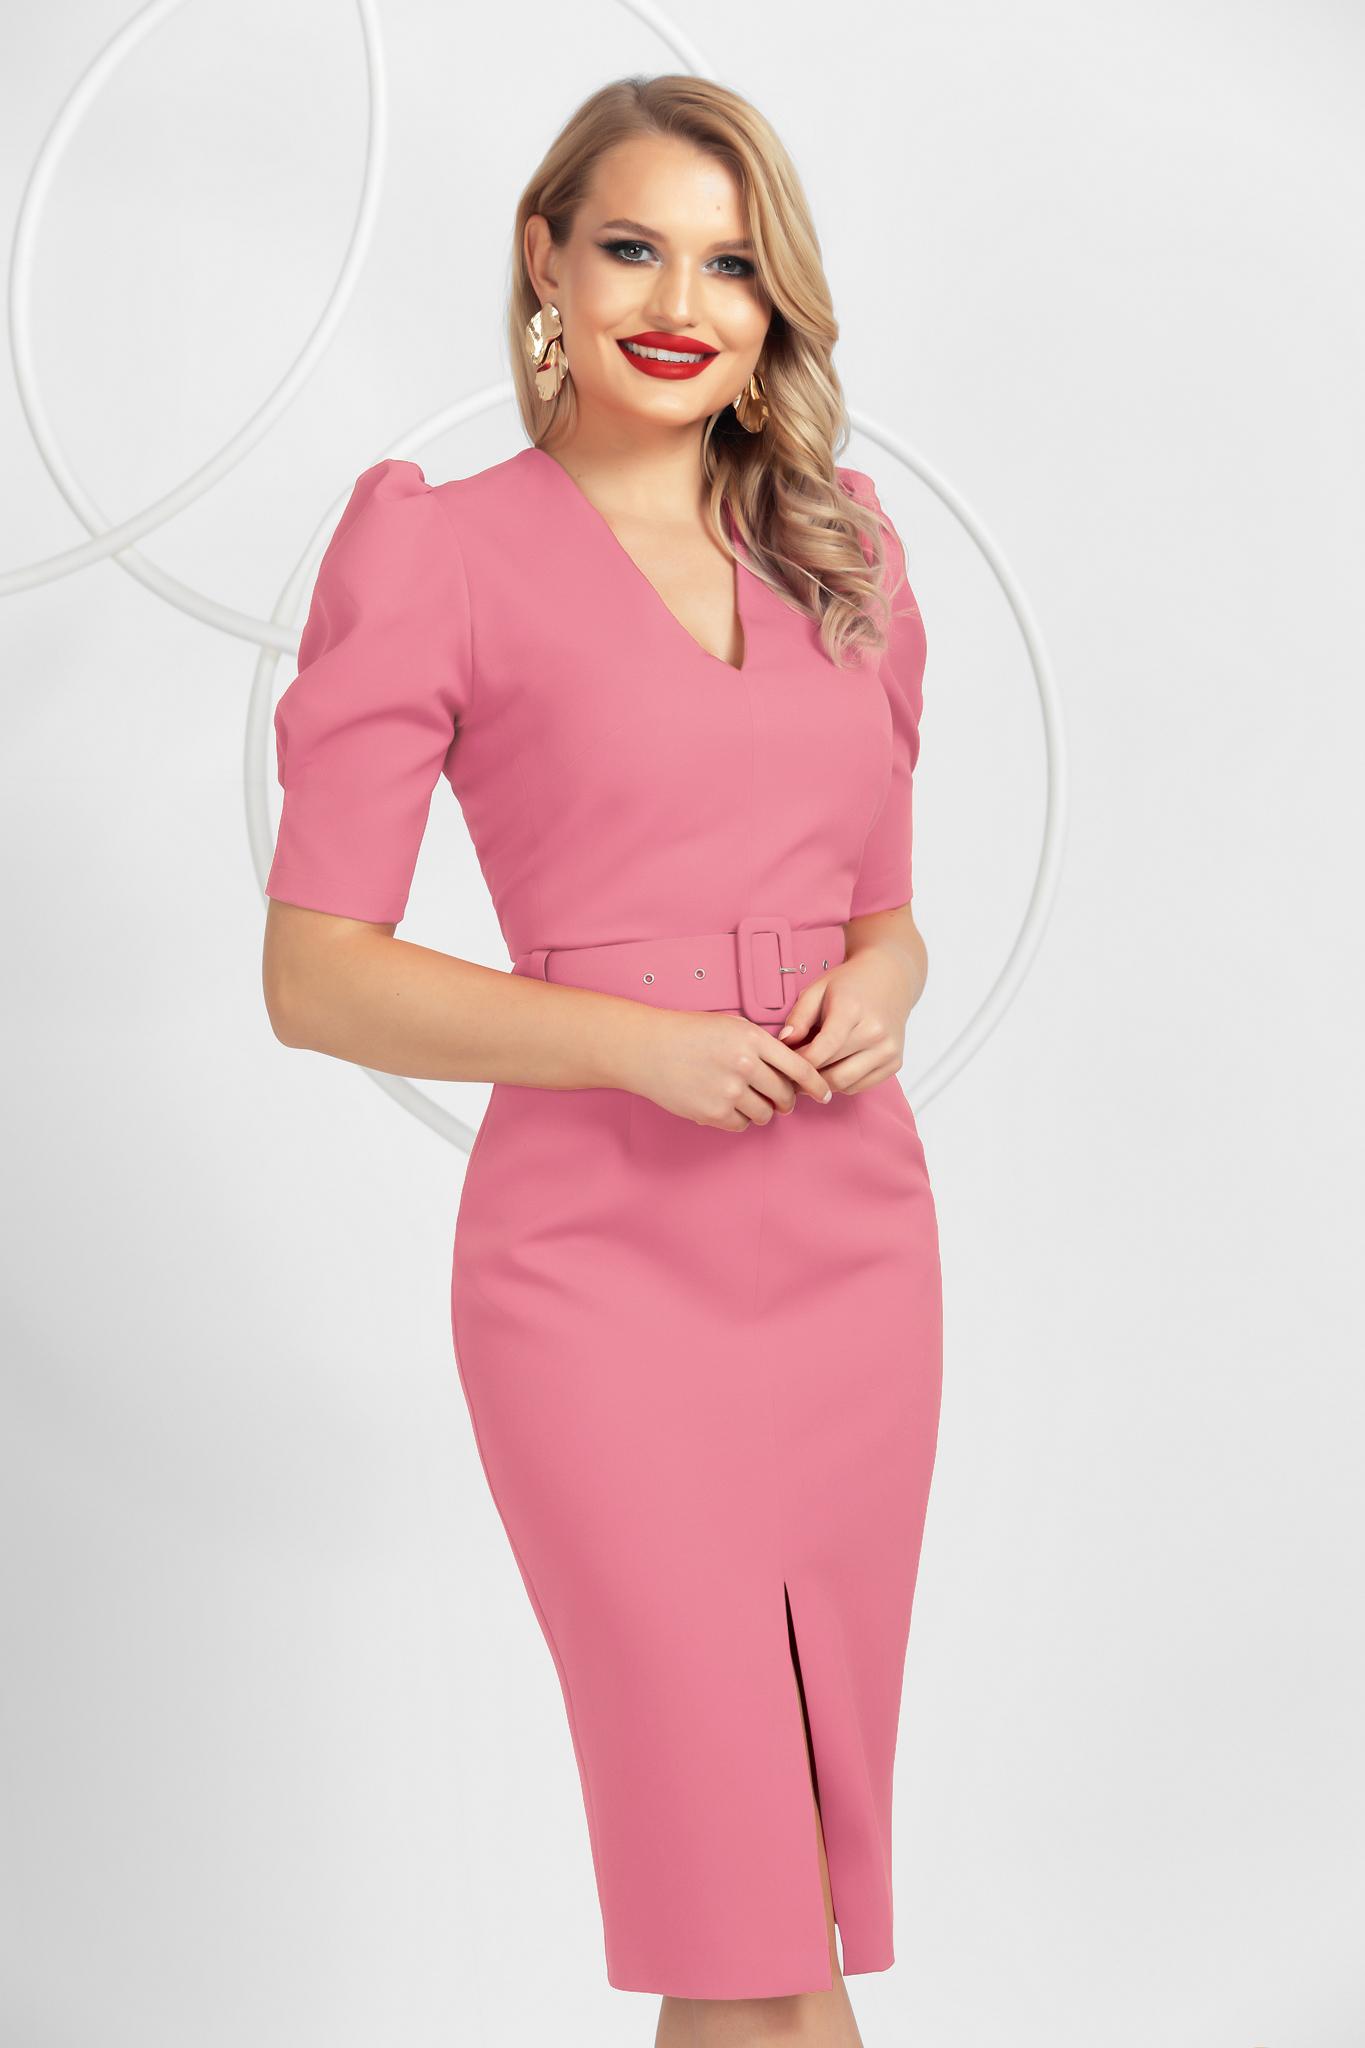 Lightpink pencil midi dress top wrinkled sleeves frontal slit